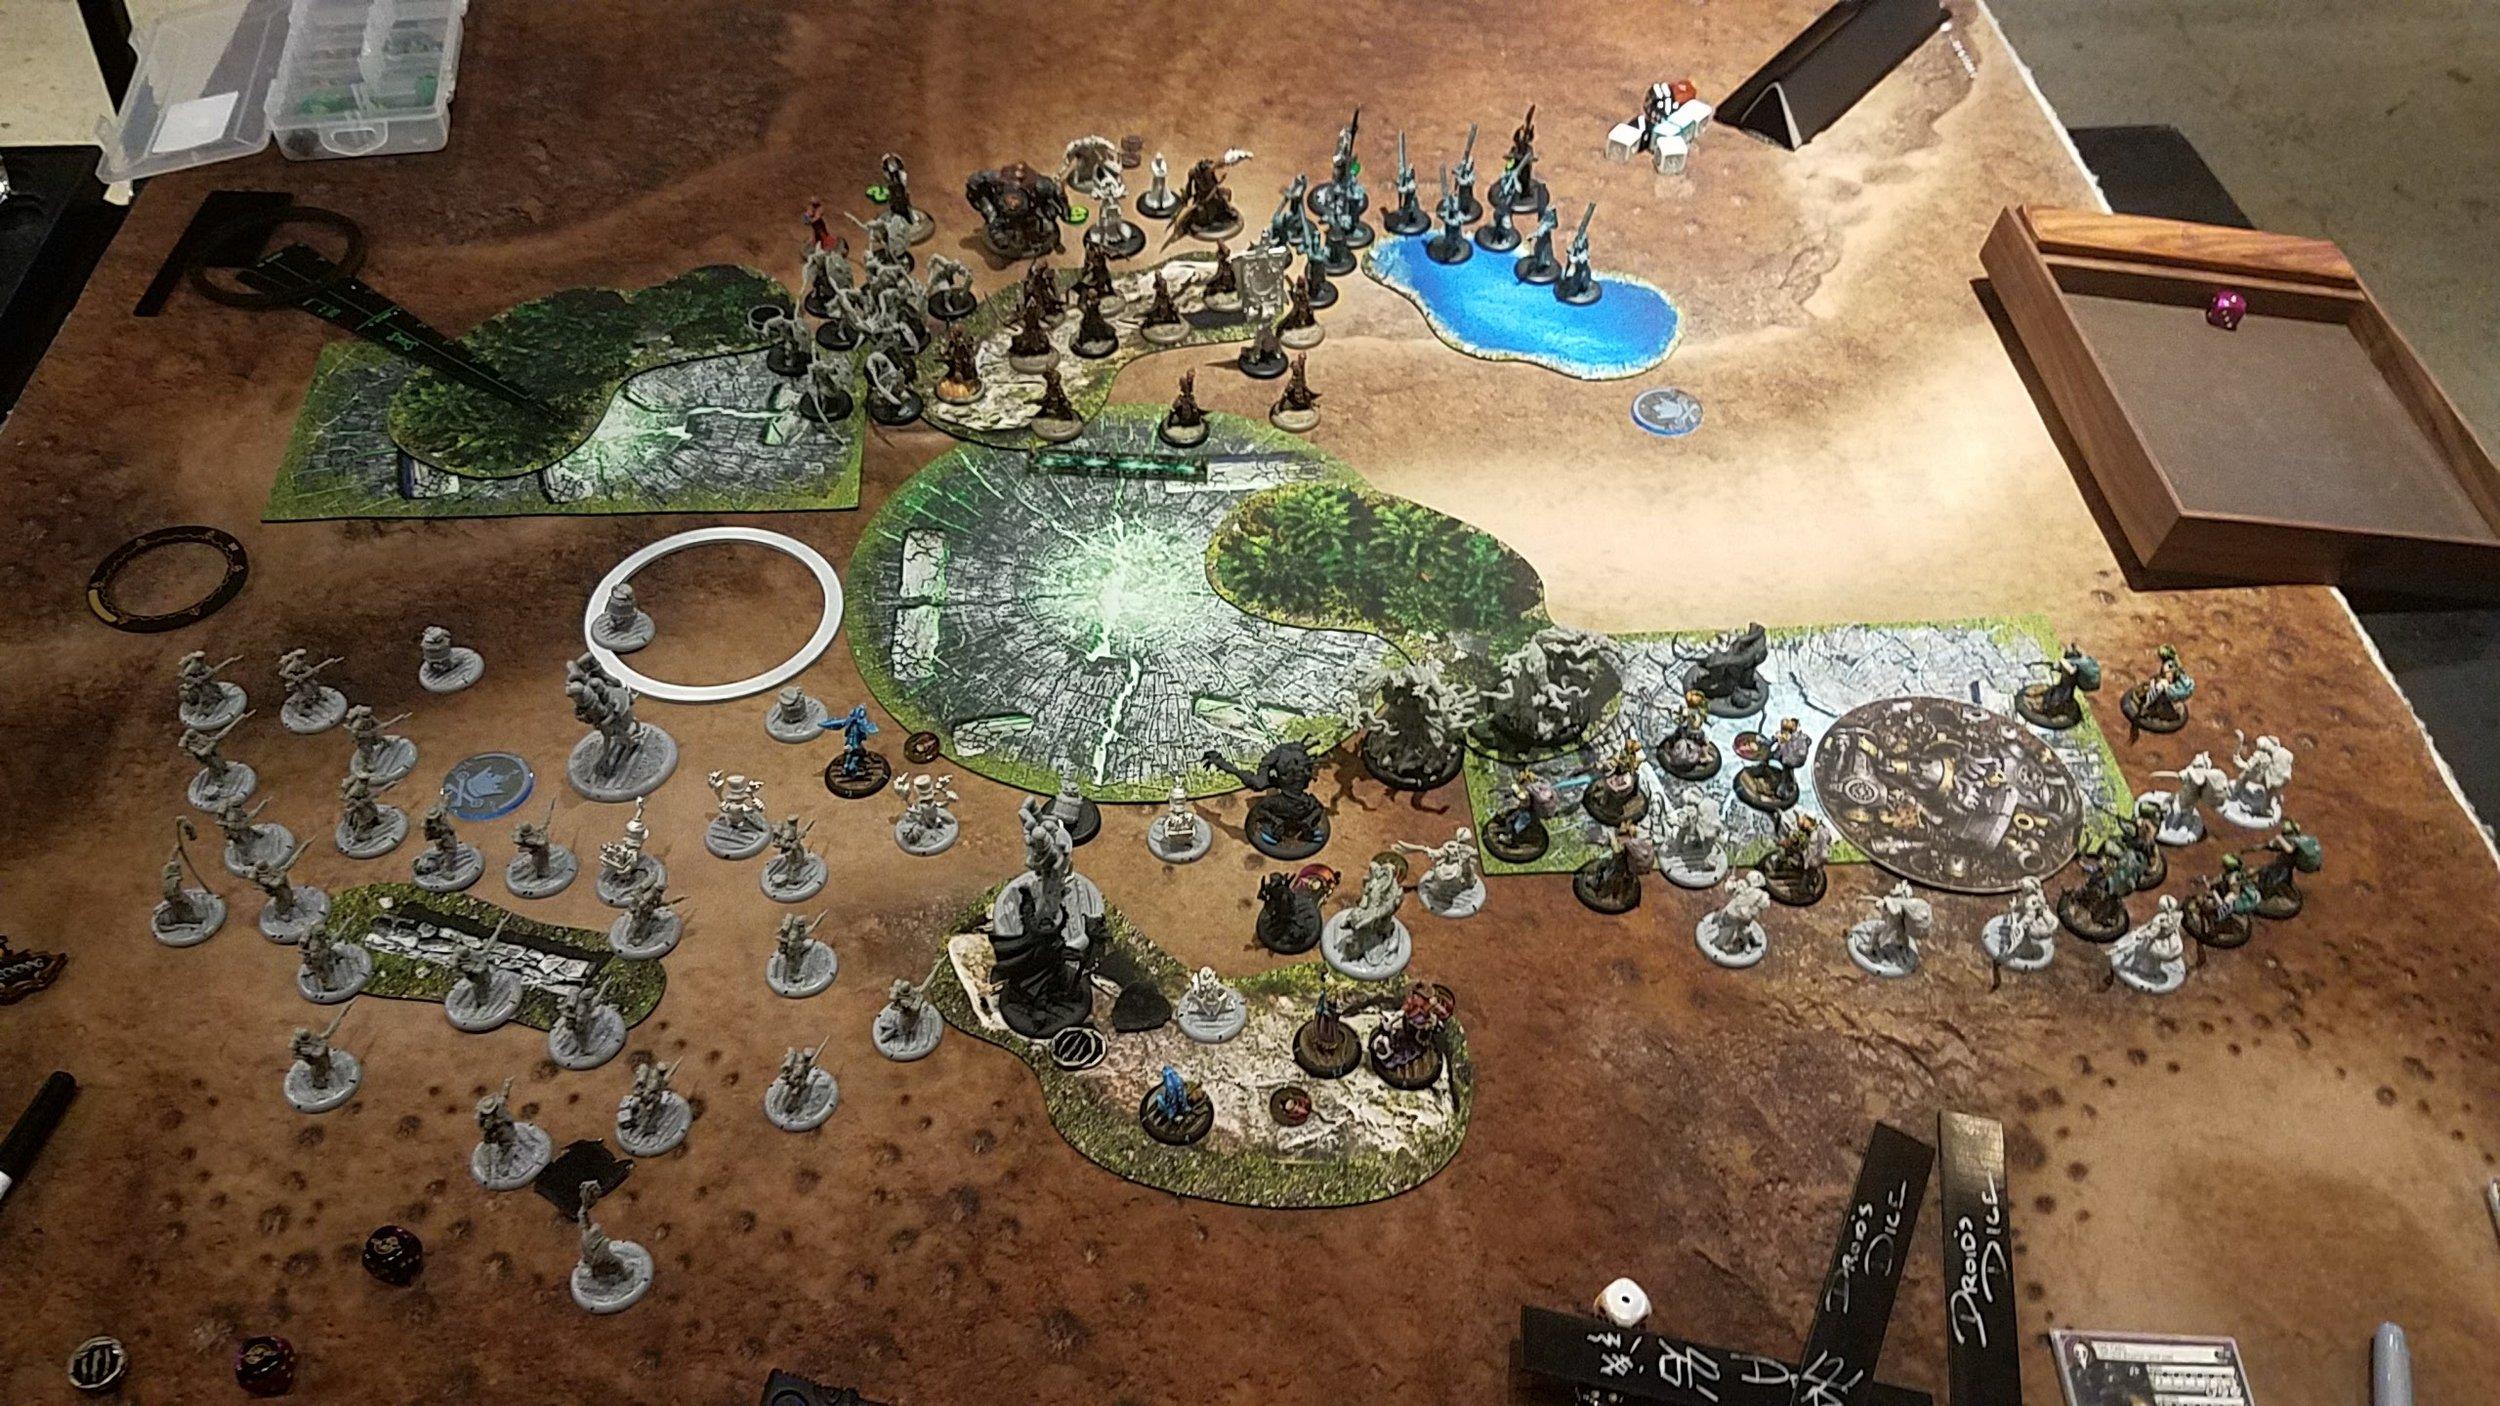 Player 2, Turn 1